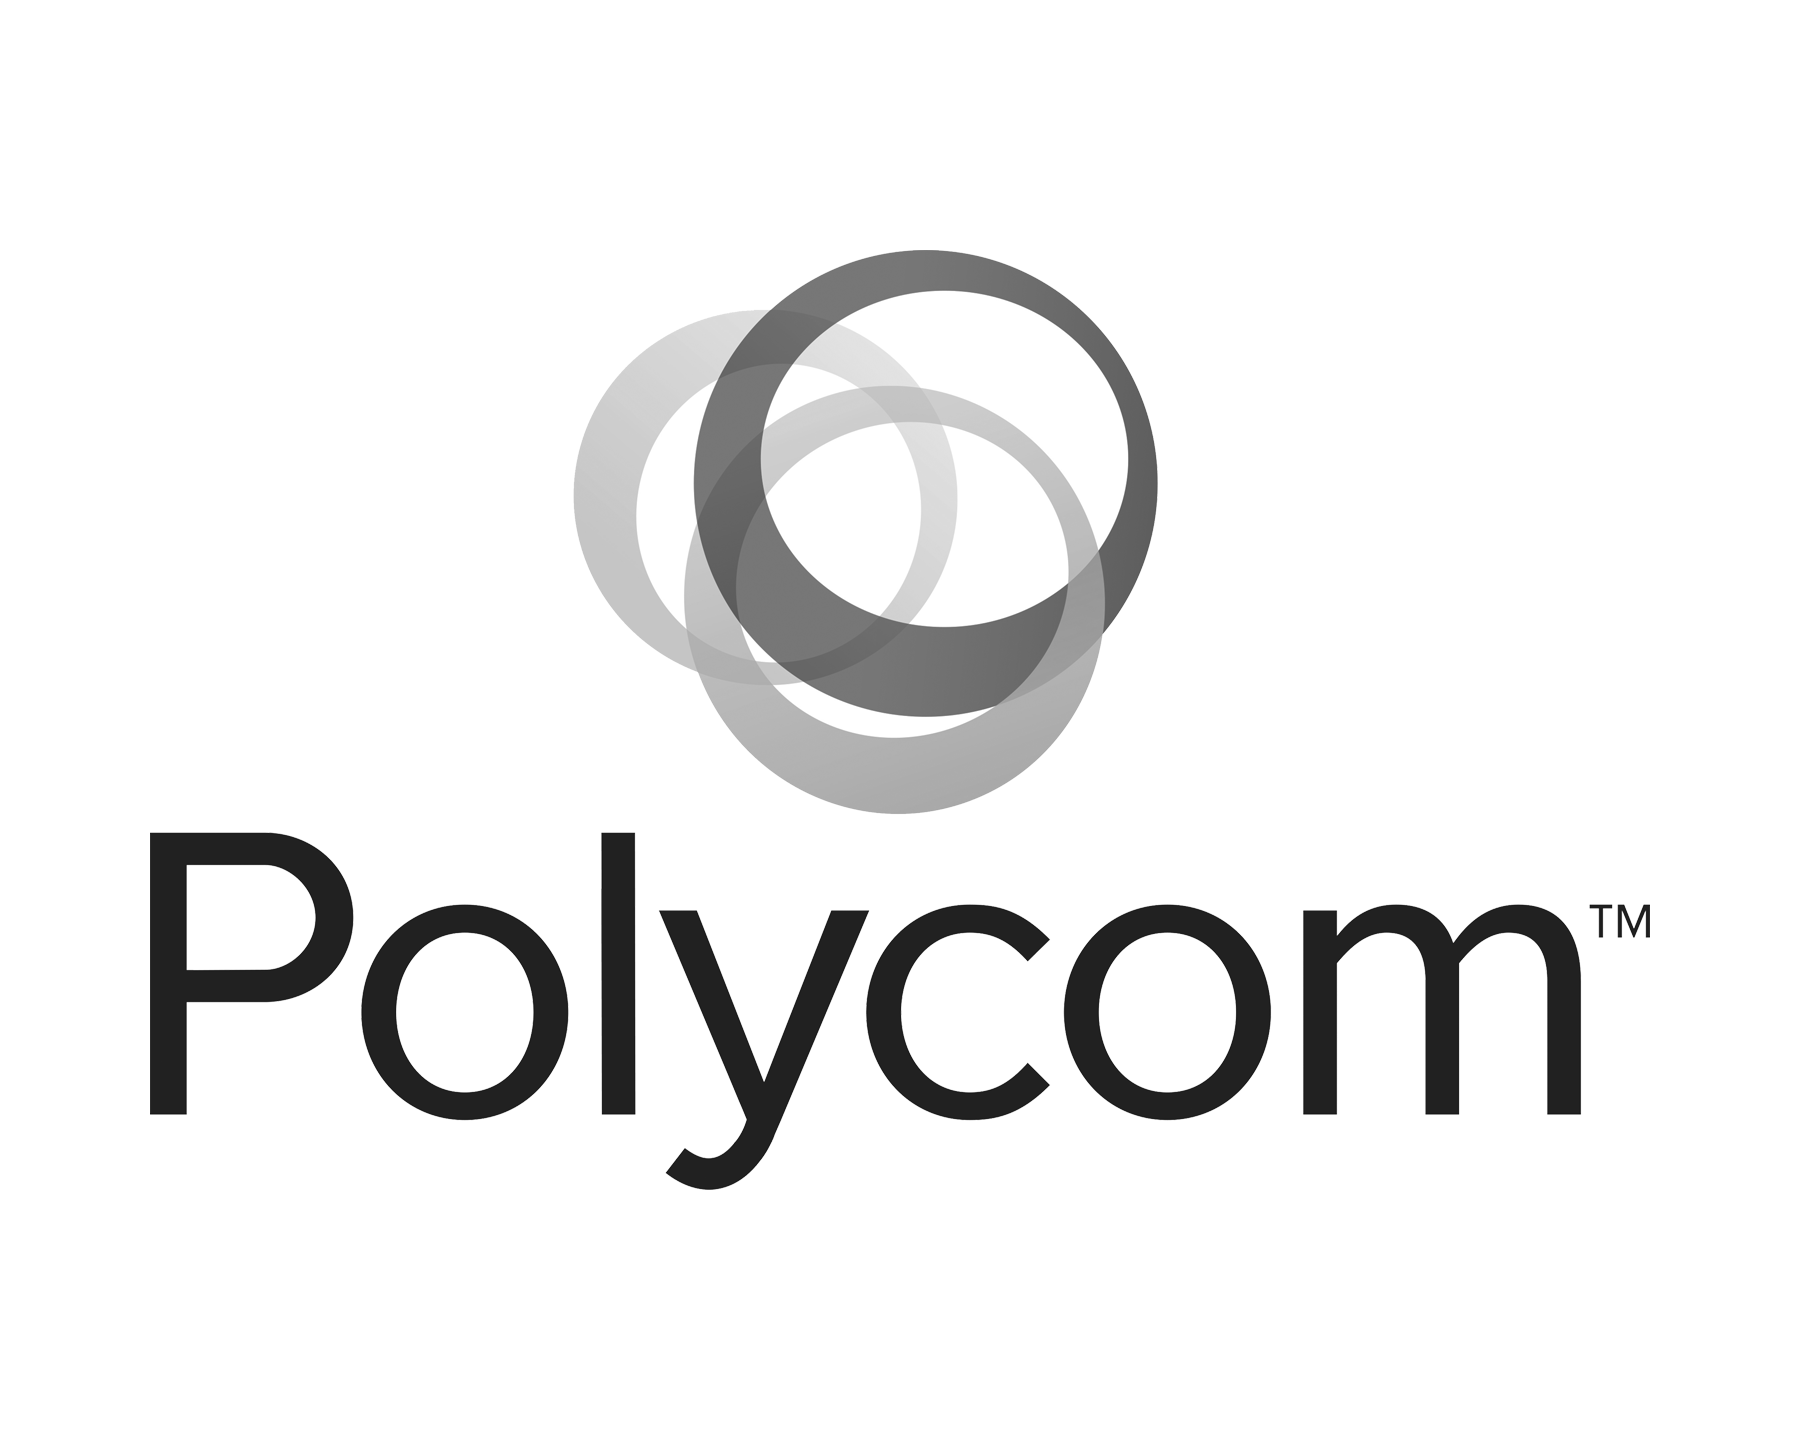 Polycom_CMYK_Logo.png